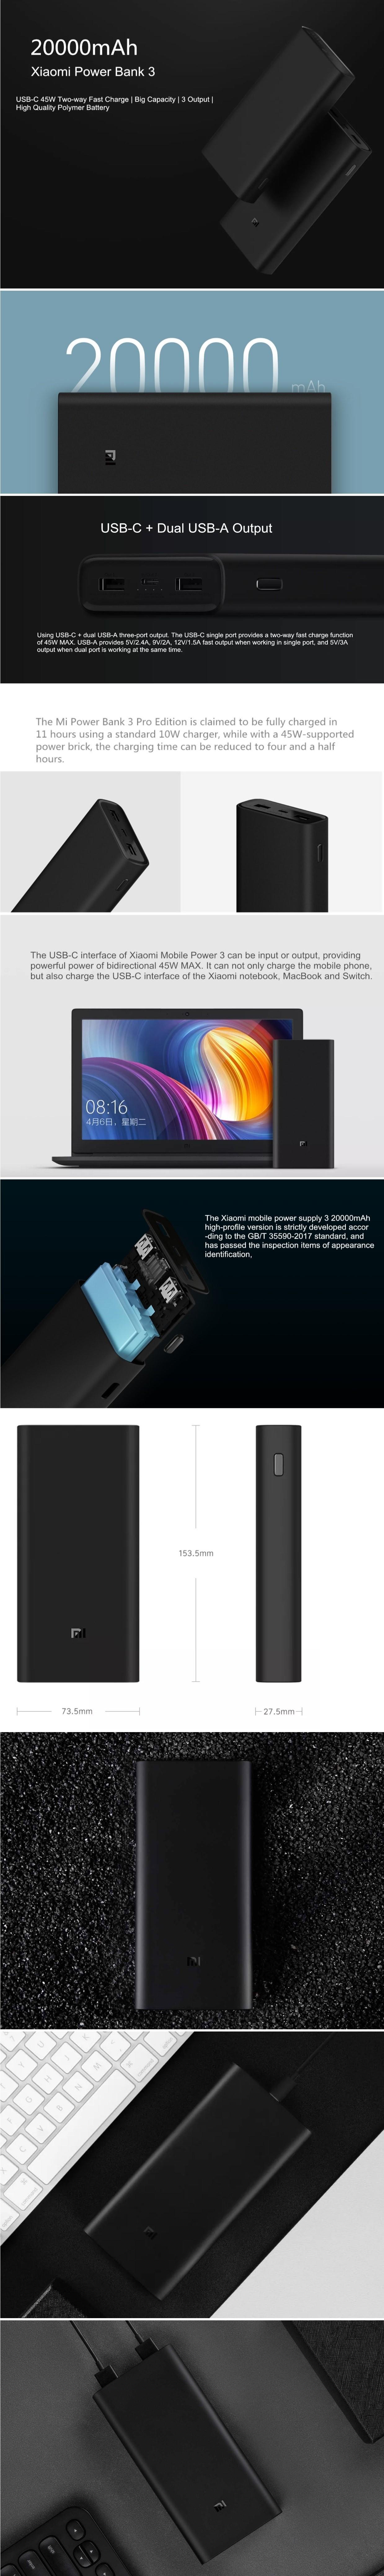 Prezentare-Xiaomi-Mi-Power-Bank-3-Probe3a061c10ac1758.jpg